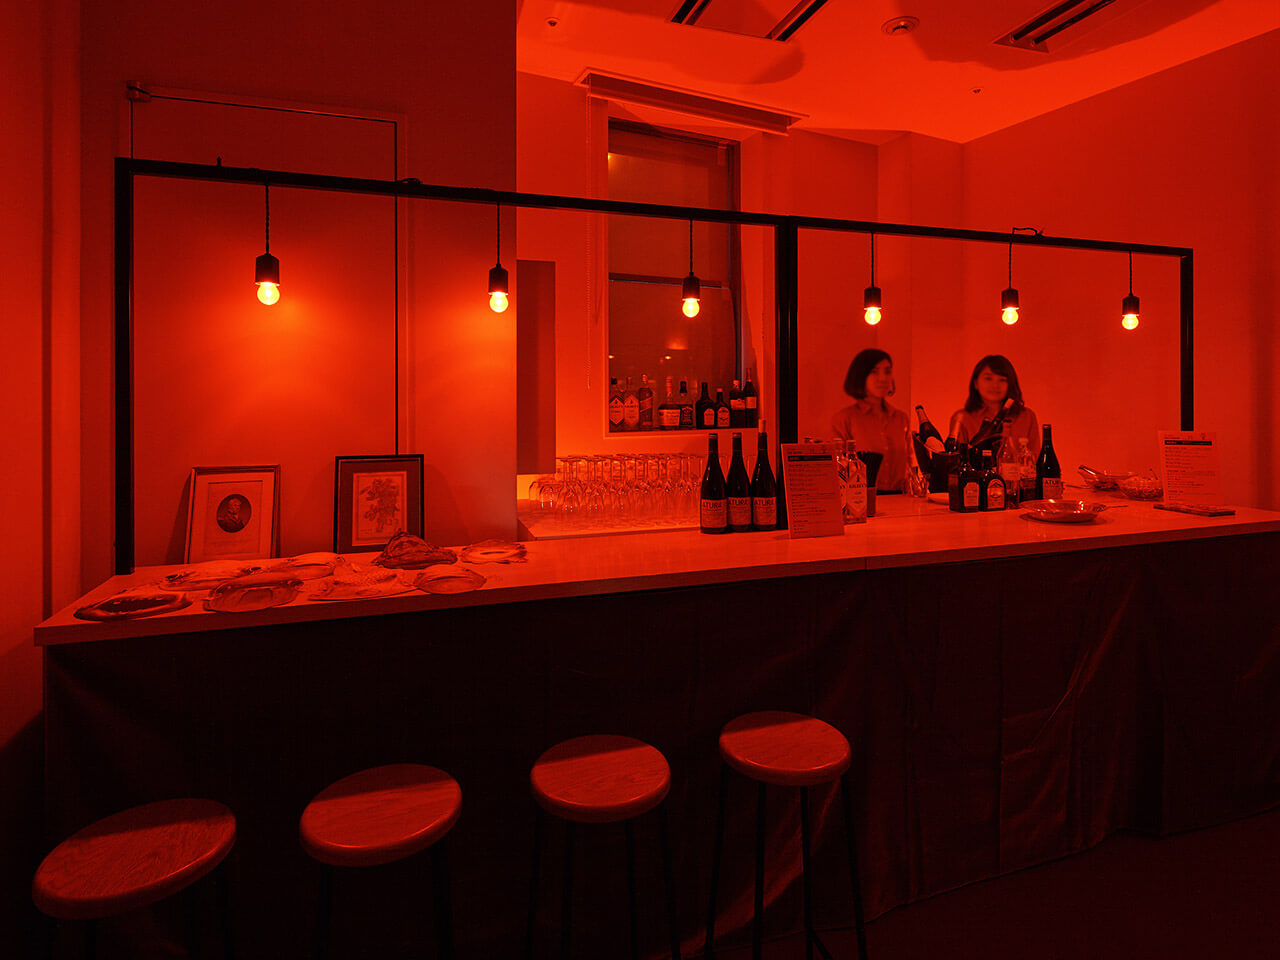 RED ROOM #3 開催風景 現代美術・アート Contemporary Art オフソサエティ offsociety